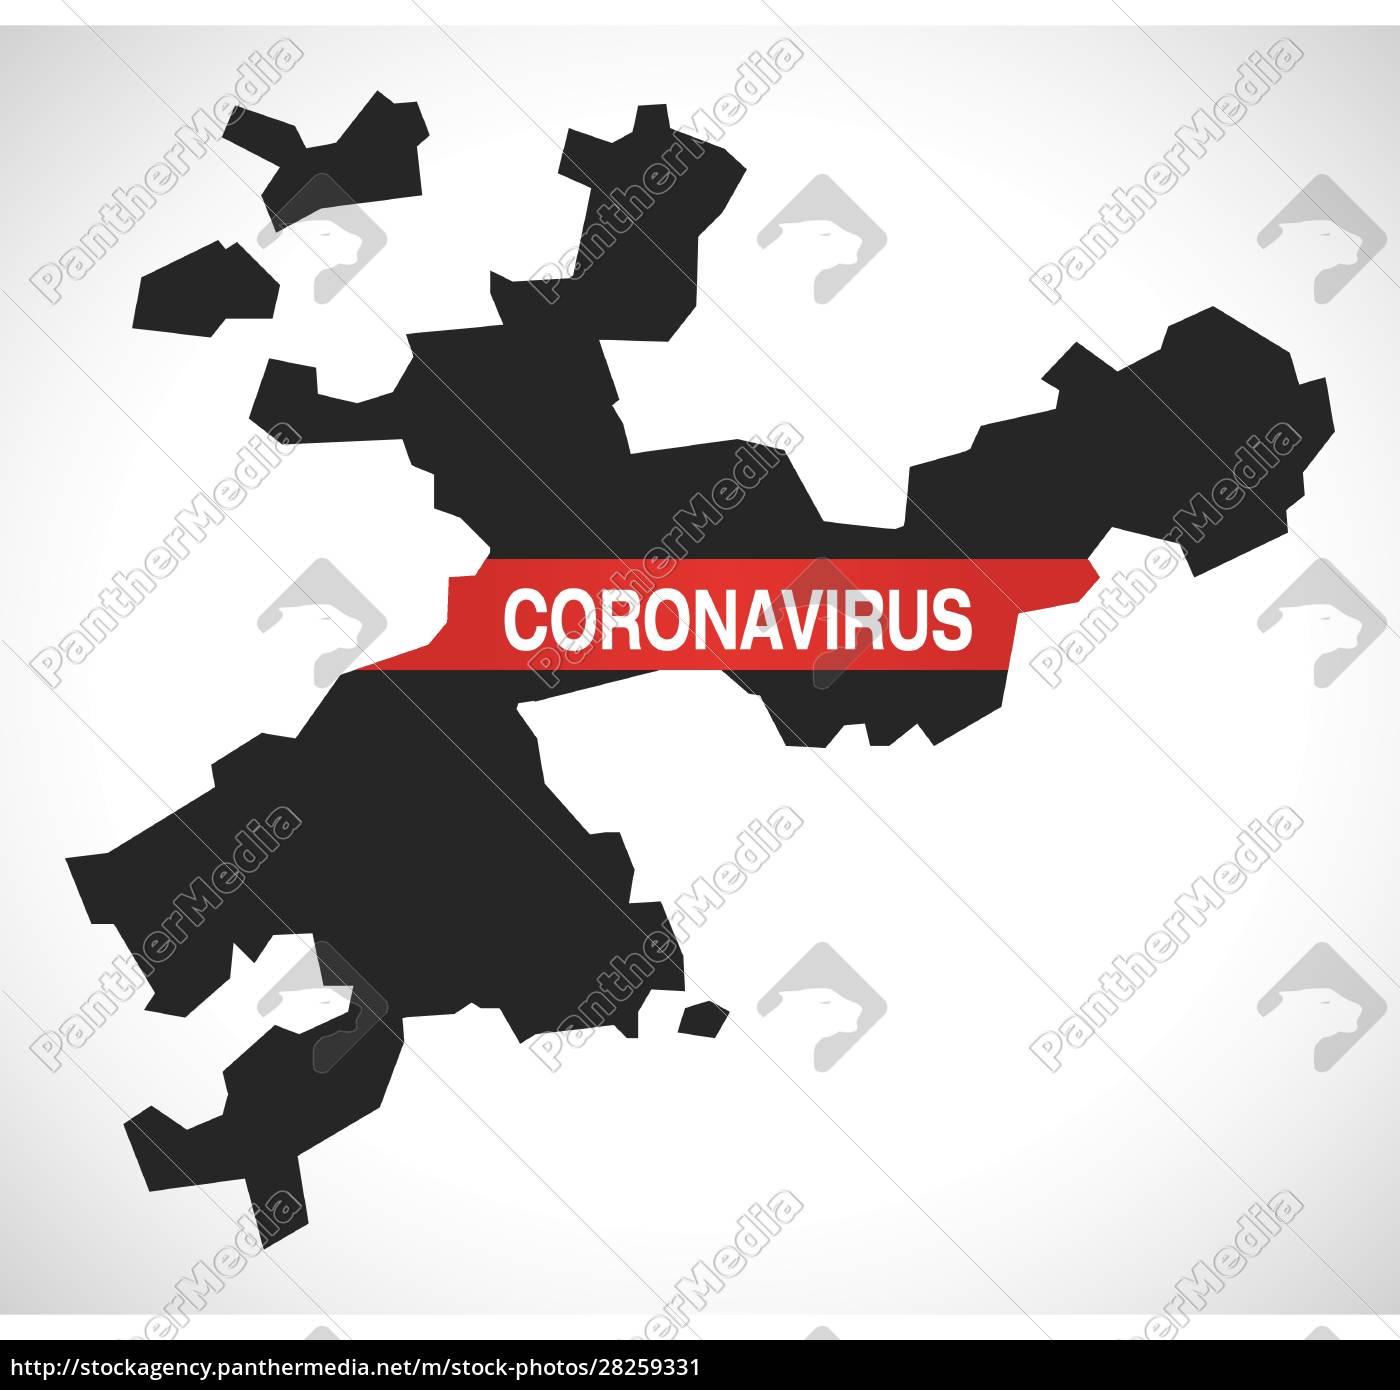 solothurn, switzerland, canton, map, with, coronavirus - 28259331